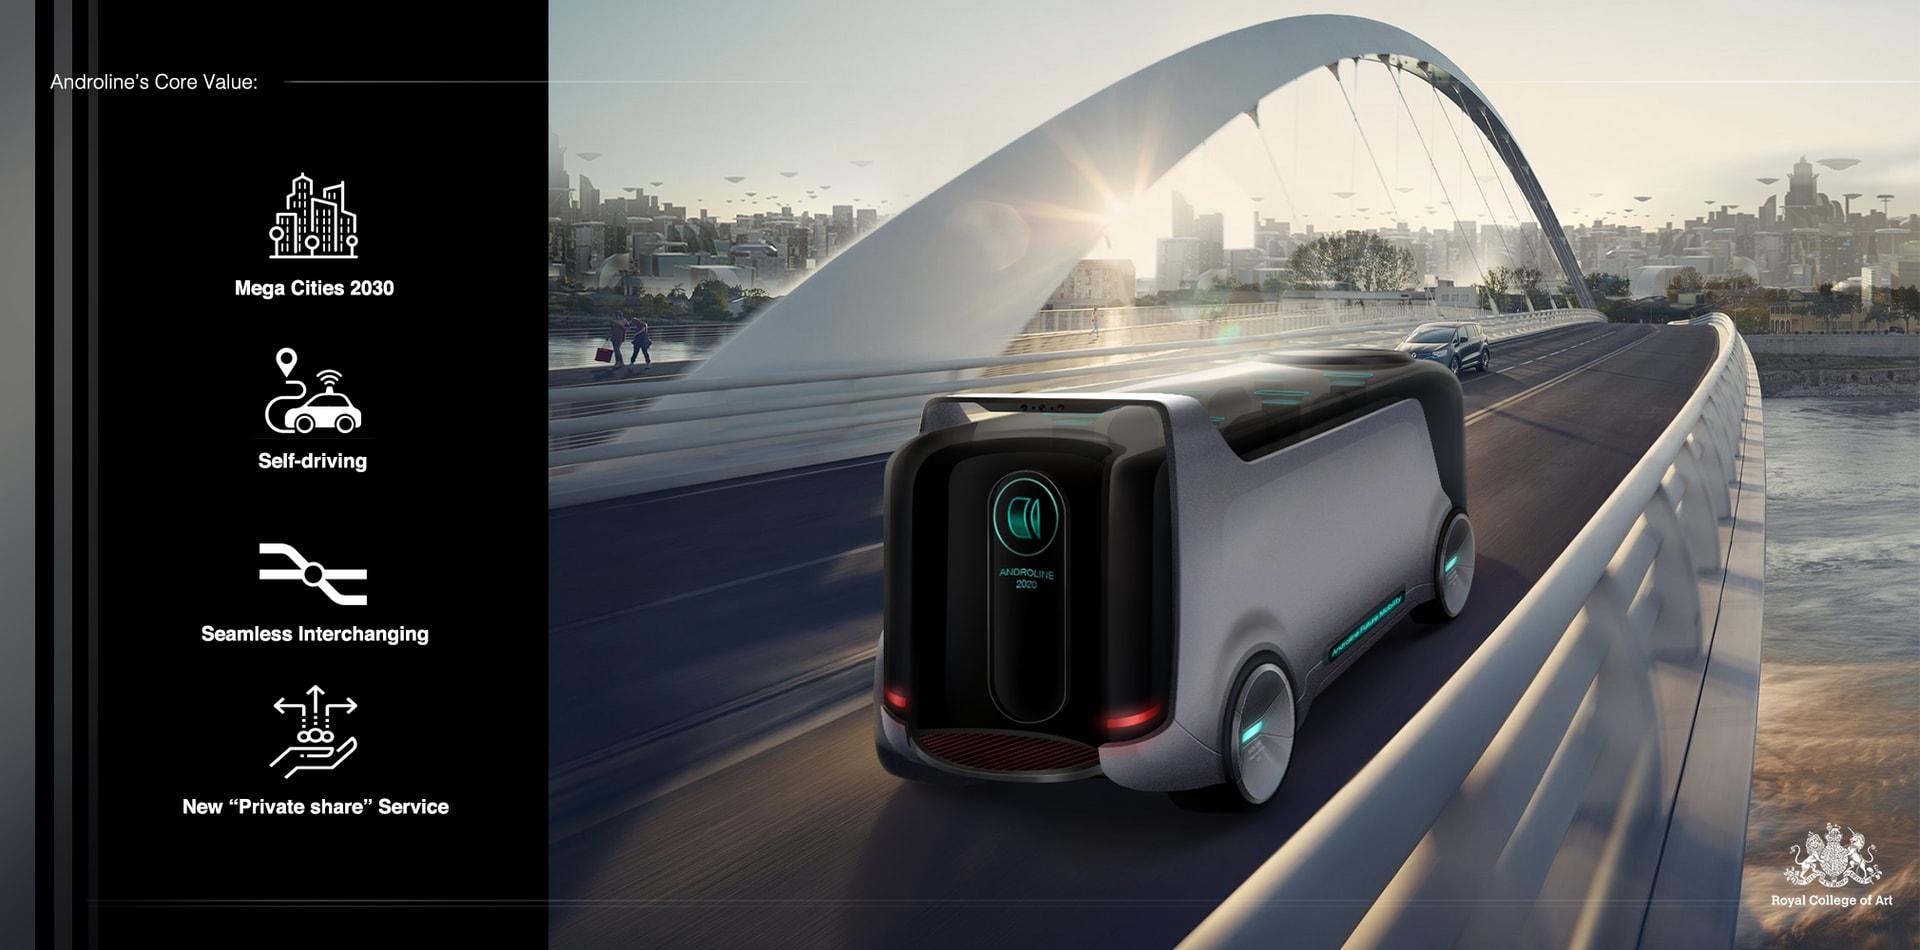 10.Androline - Future mini bus